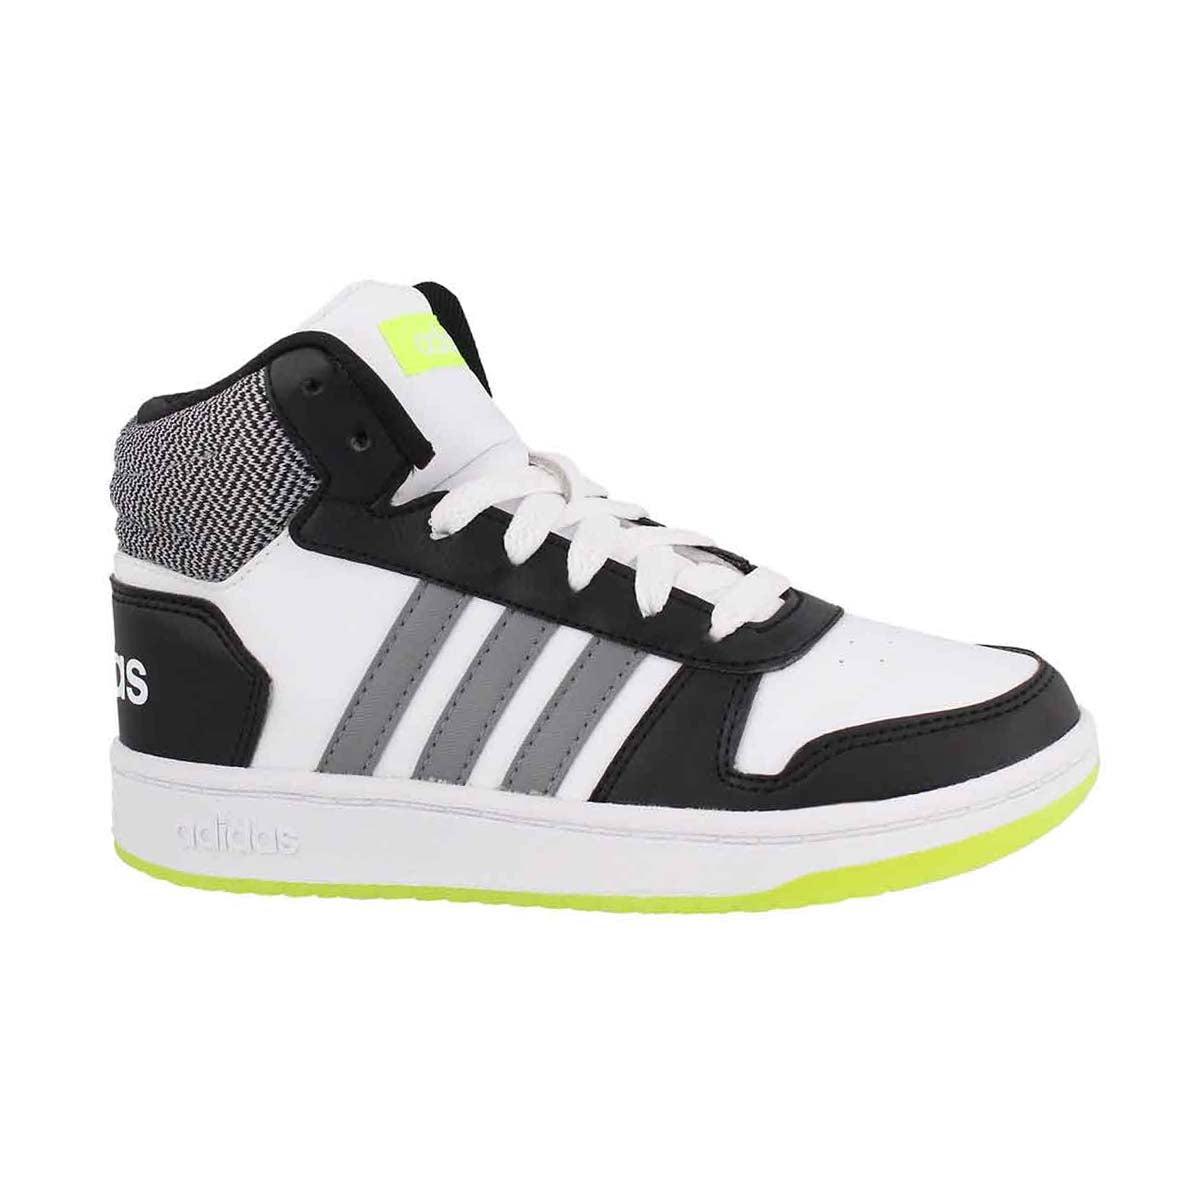 Boys' V5 HOOPS MID 2.0 white/grey/black sneakers